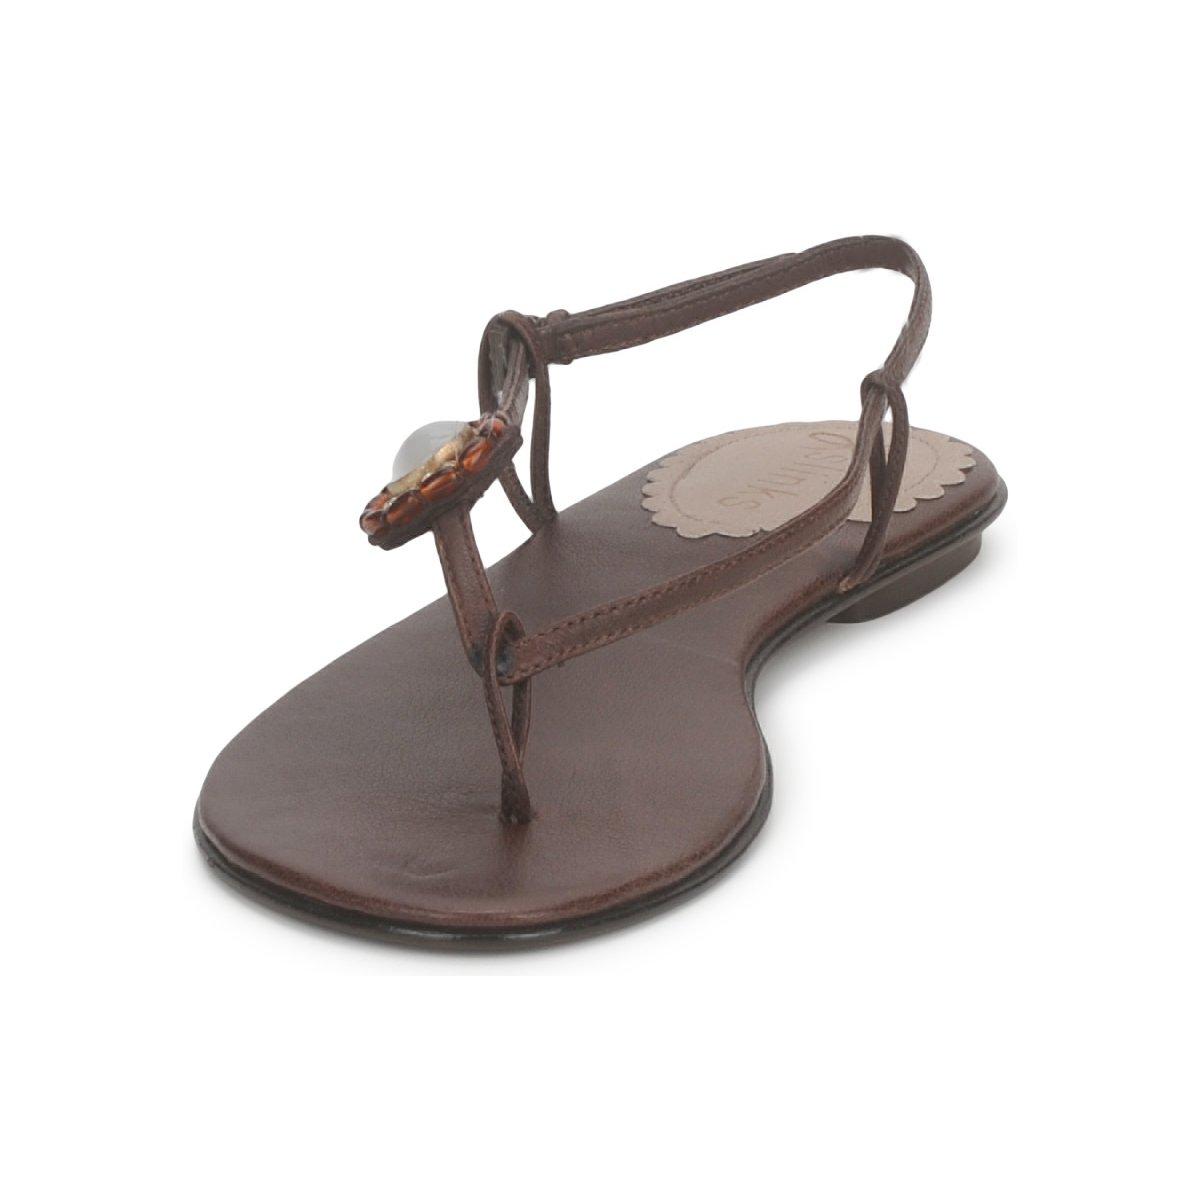 Slinks Katie Rose & Mowana Moon Chocolate - Livraison Gratuite Chaussures Sandale Femme 55,30 €